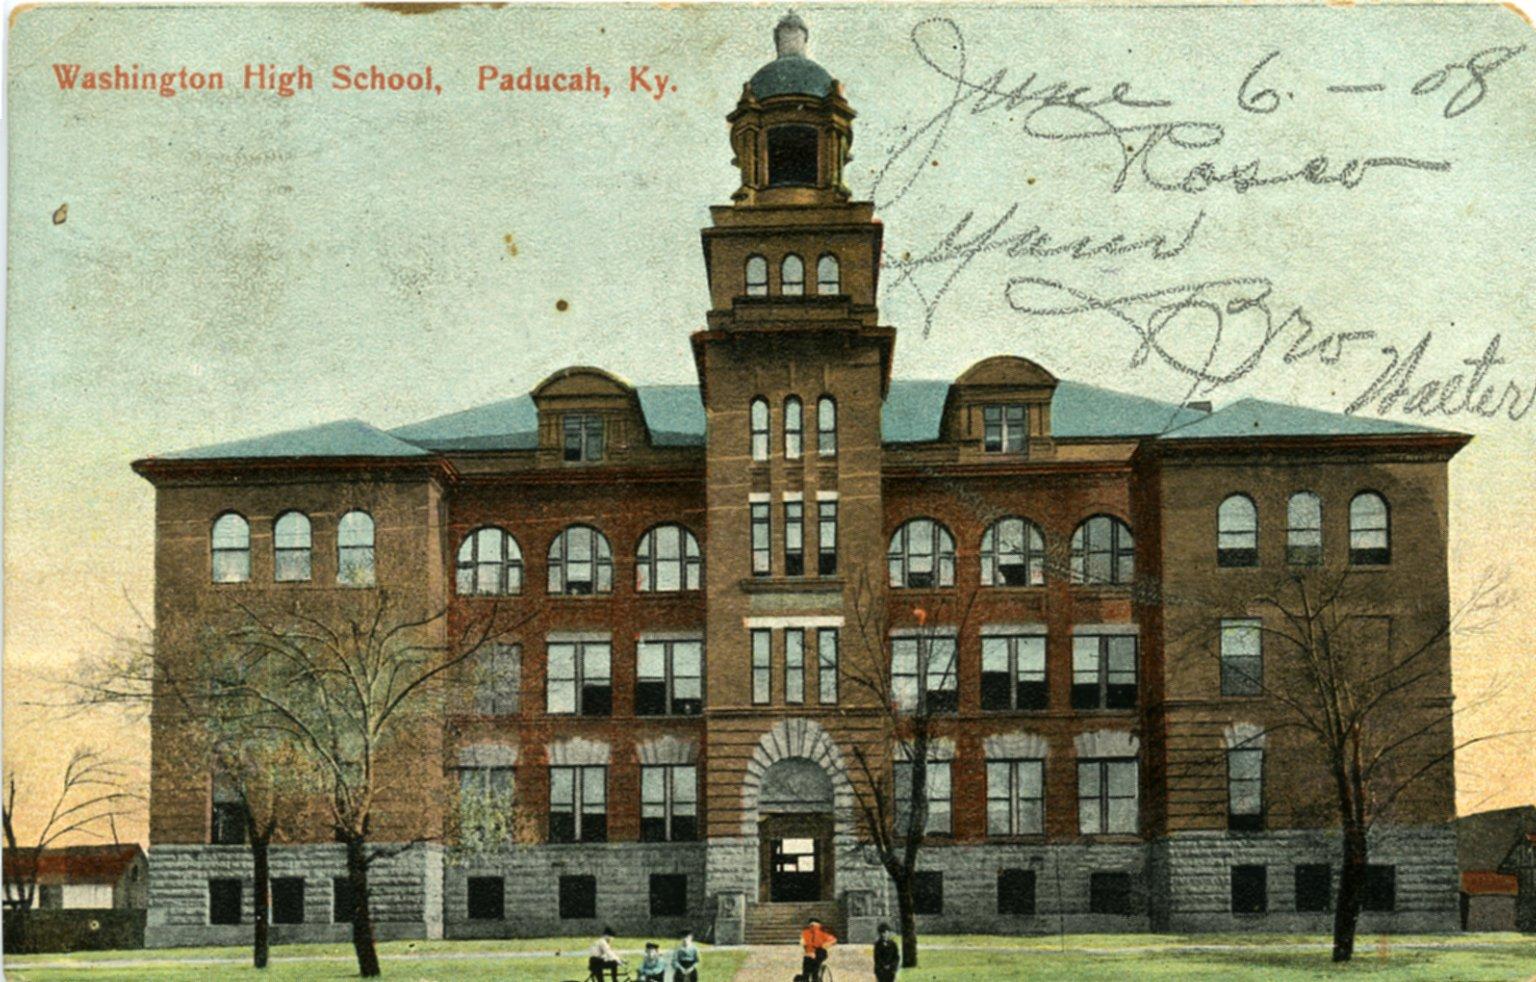 Washington High School, Paducah, Ky.